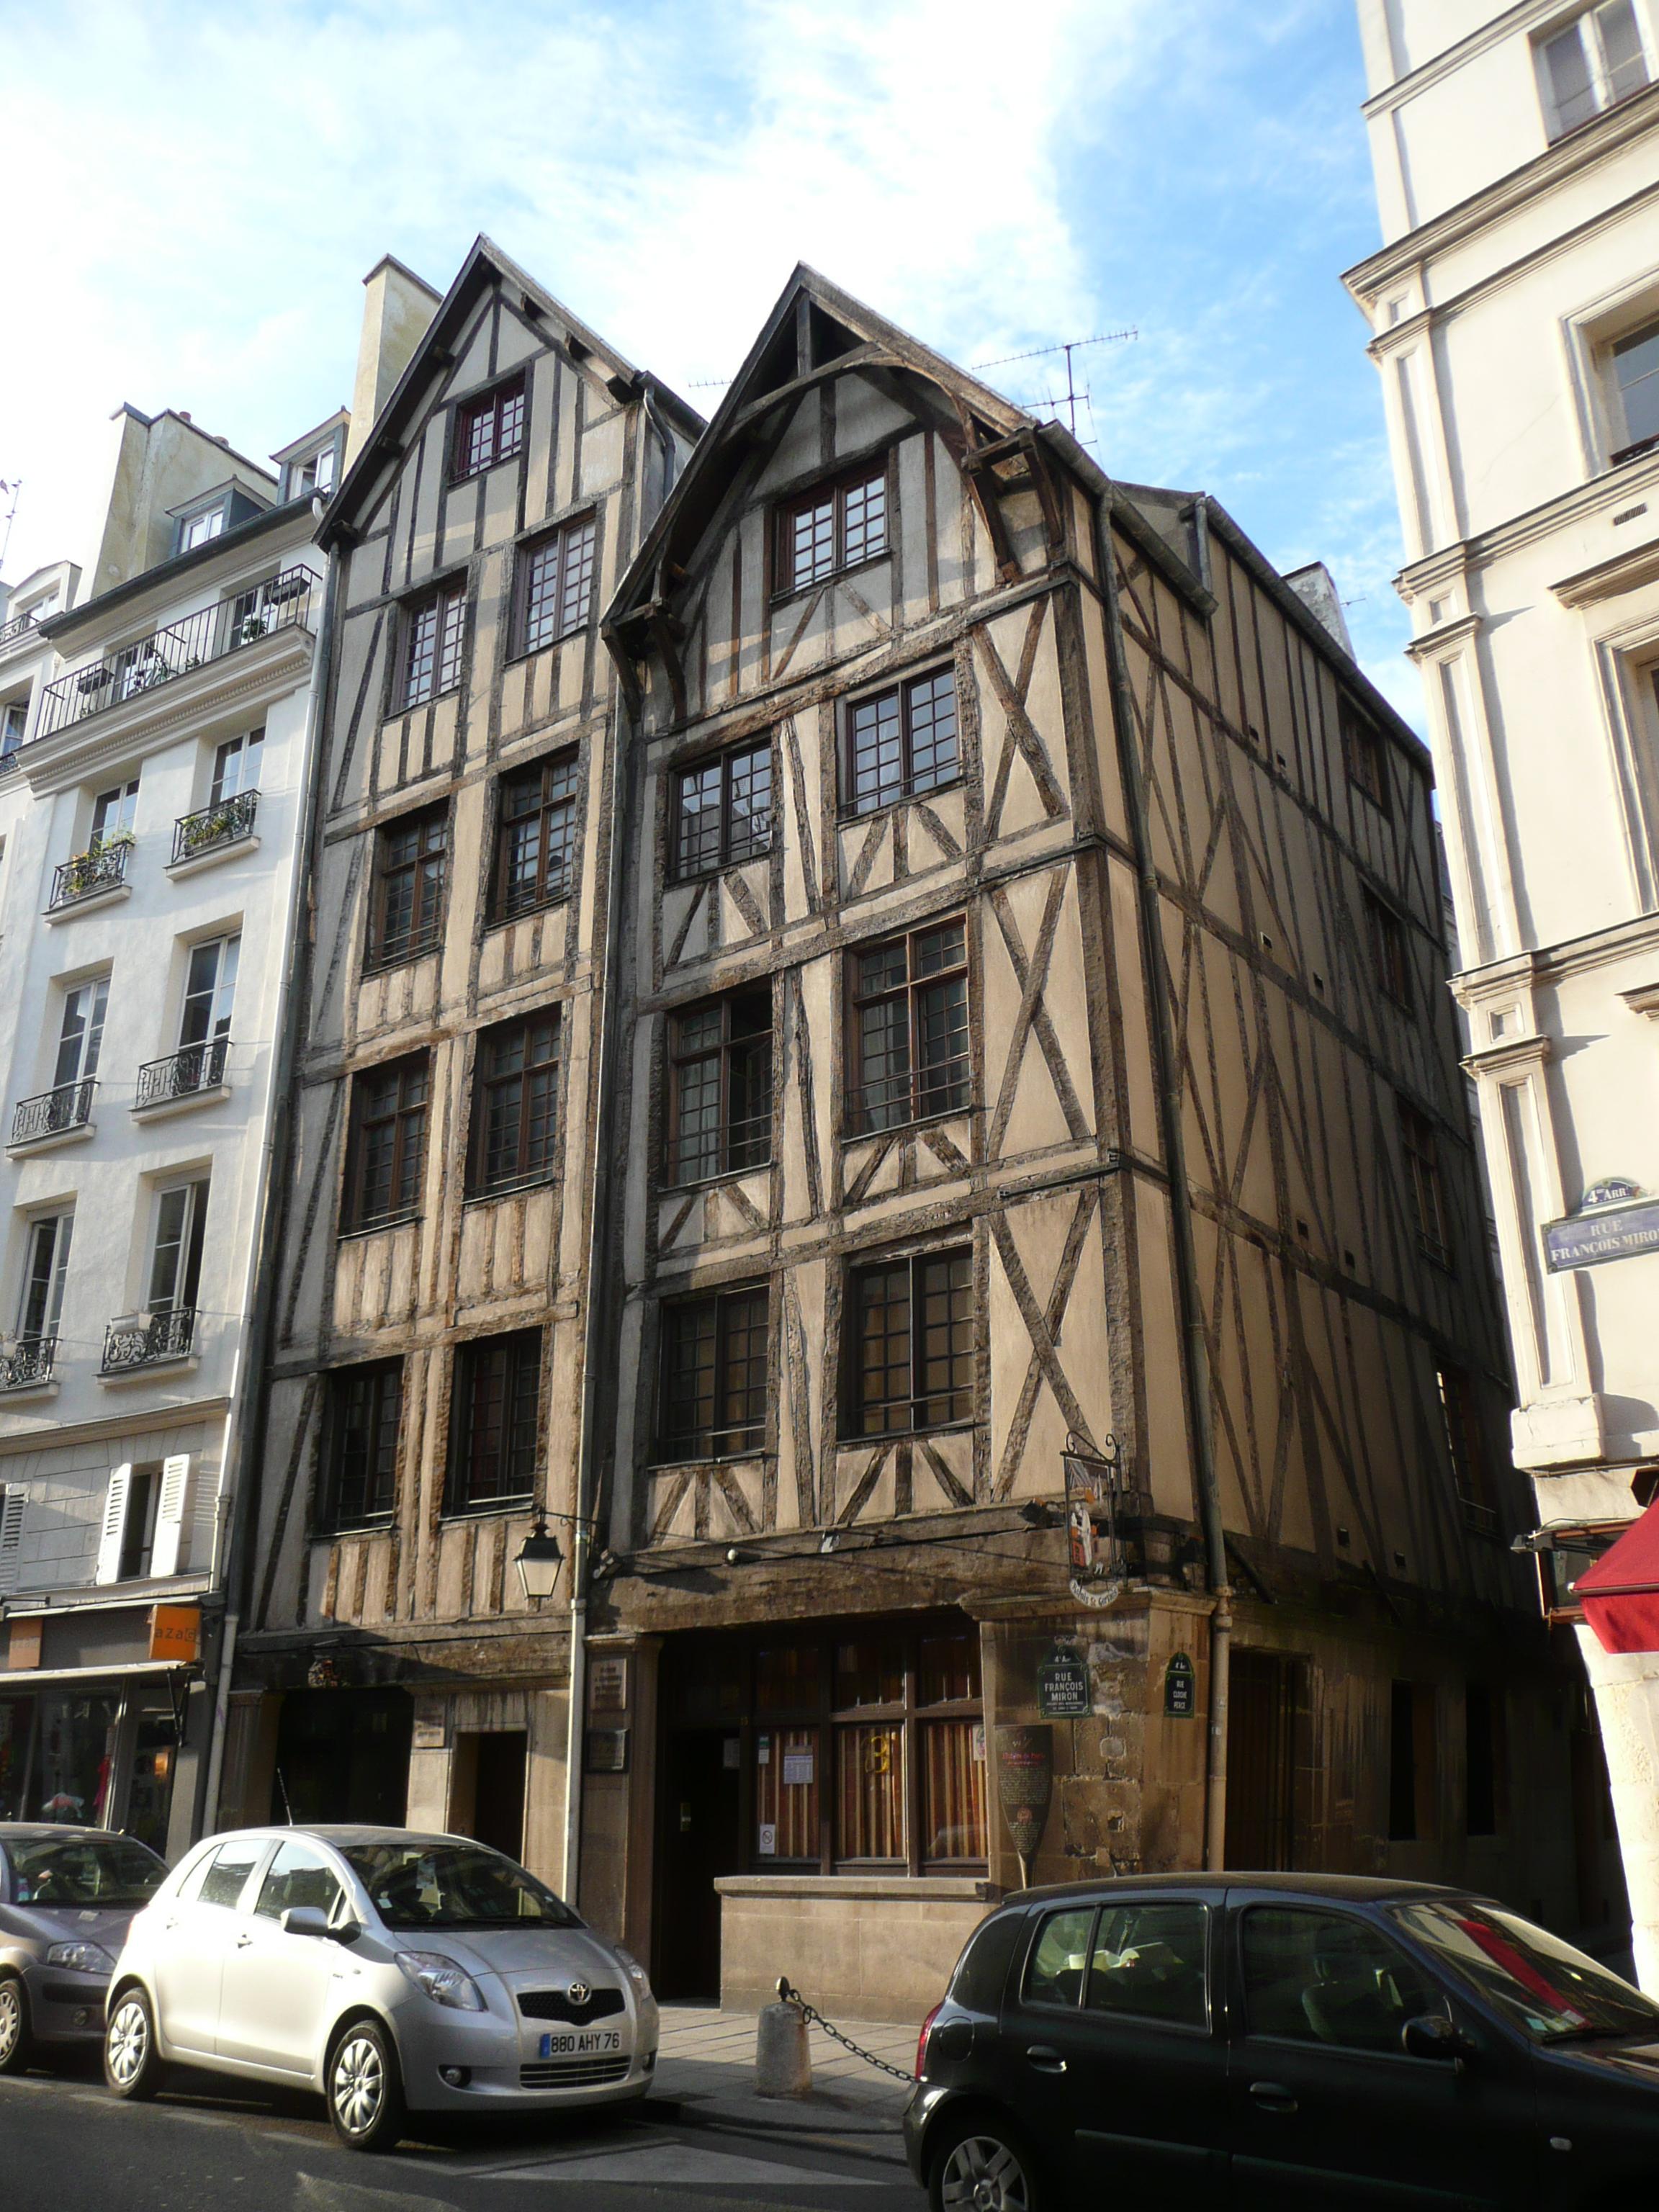 File Demeures M 233 Di 233 Vales Paris France Jpg Wikimedia